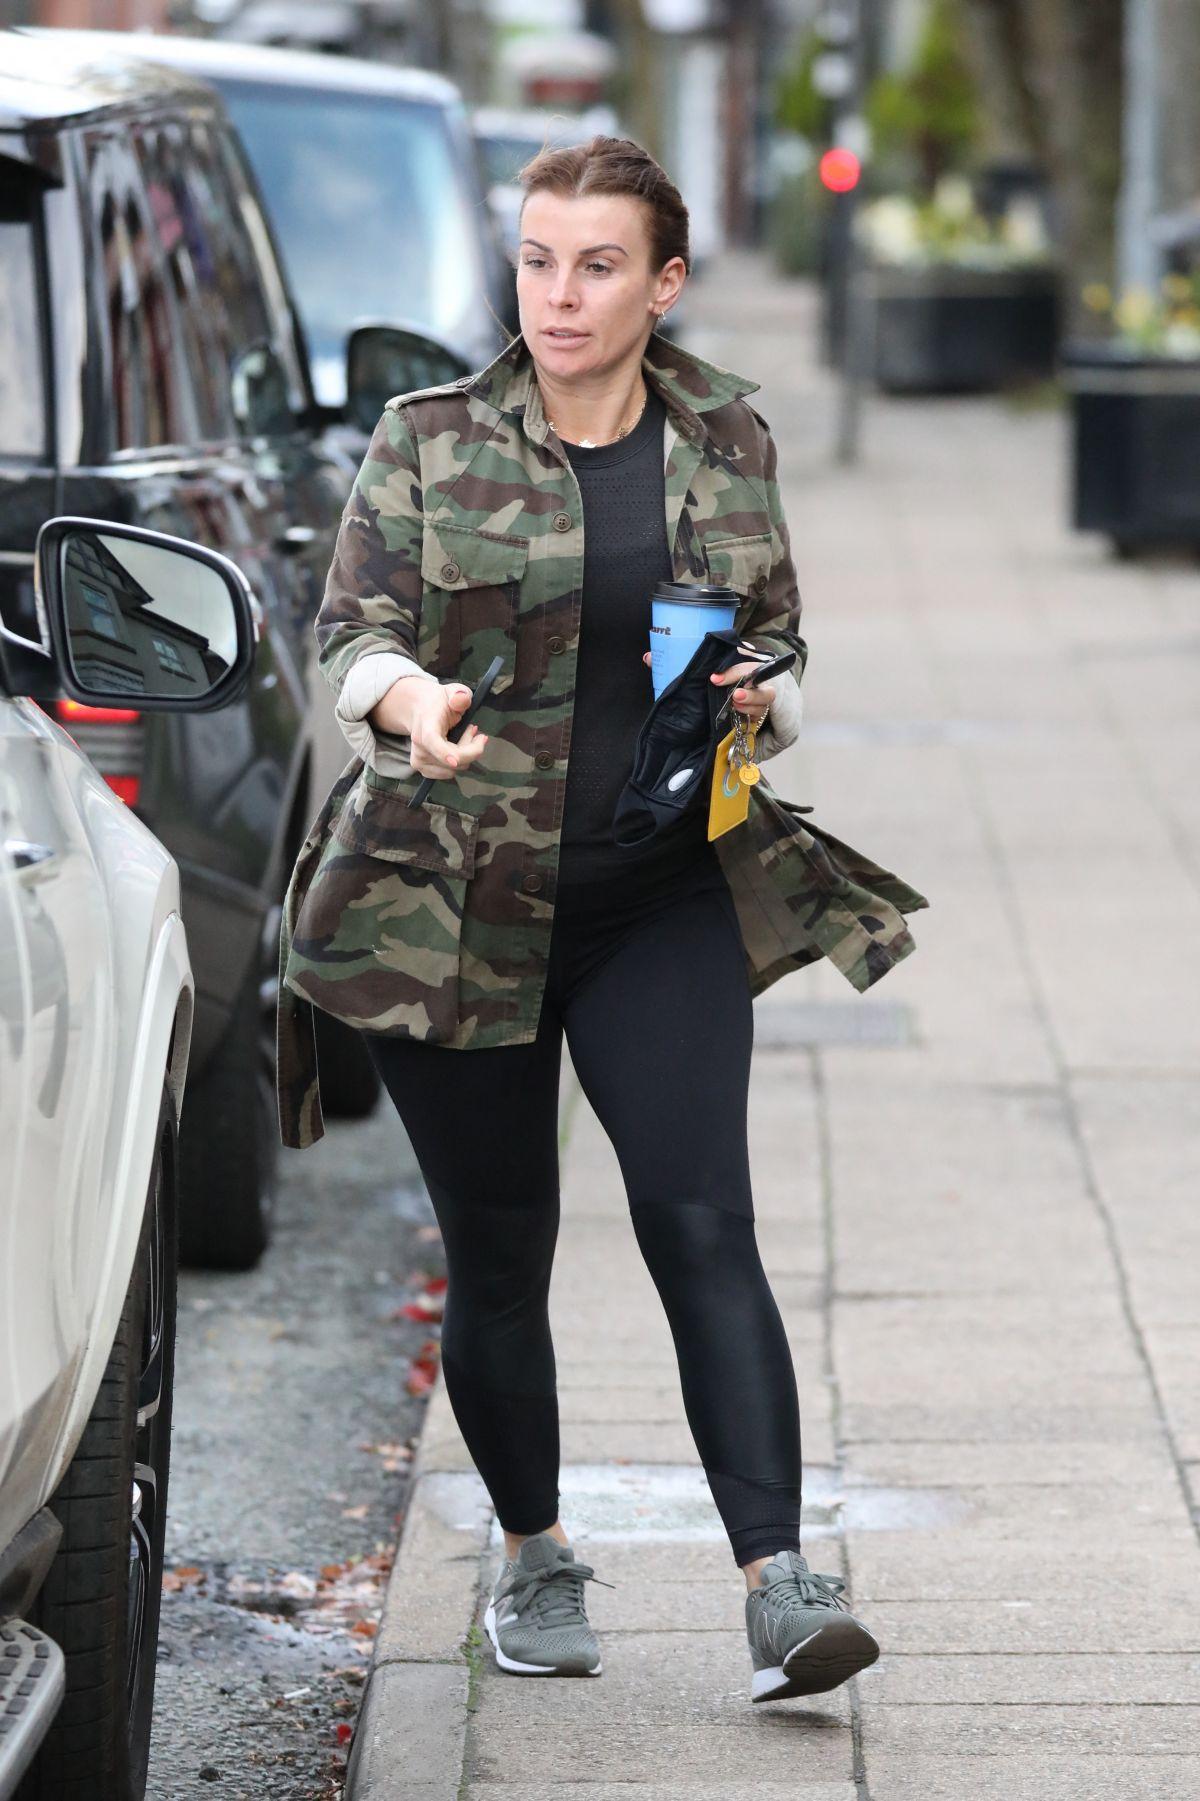 Terhesen is magas sarkút visel Rooney neje